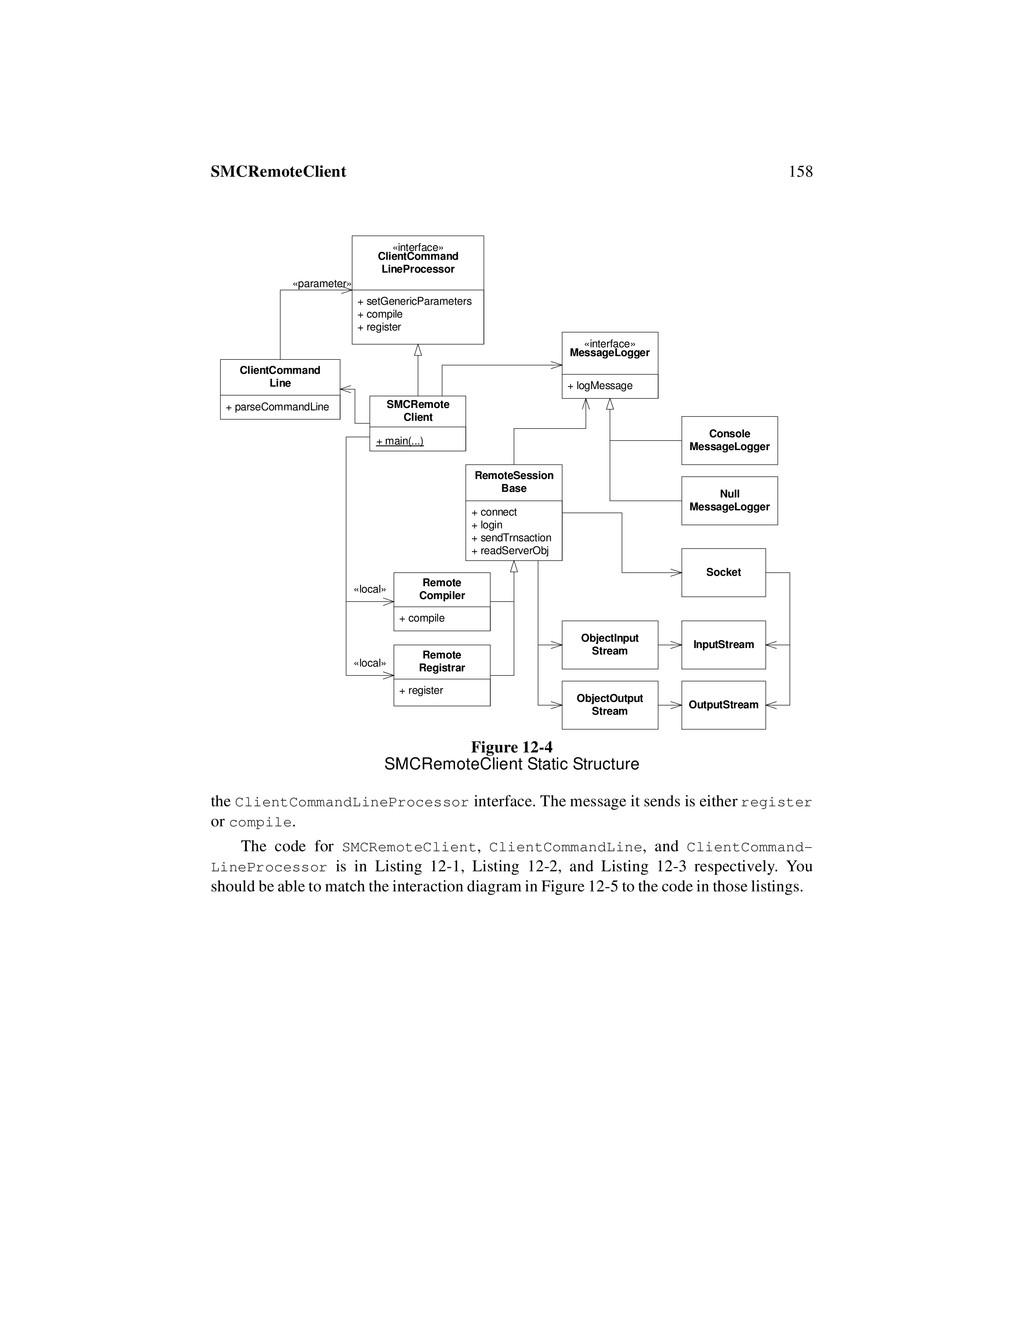 158 SMCRemoteClient the ClientCommandLineProces...